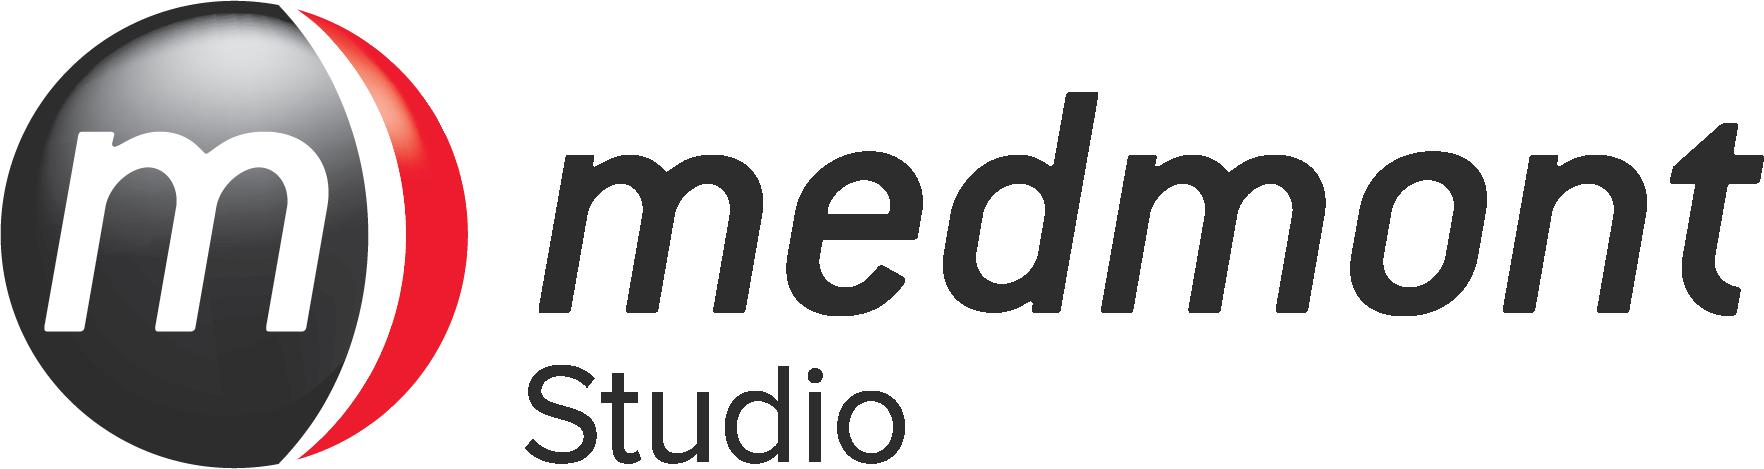 19_medmont_studio_logo_Black